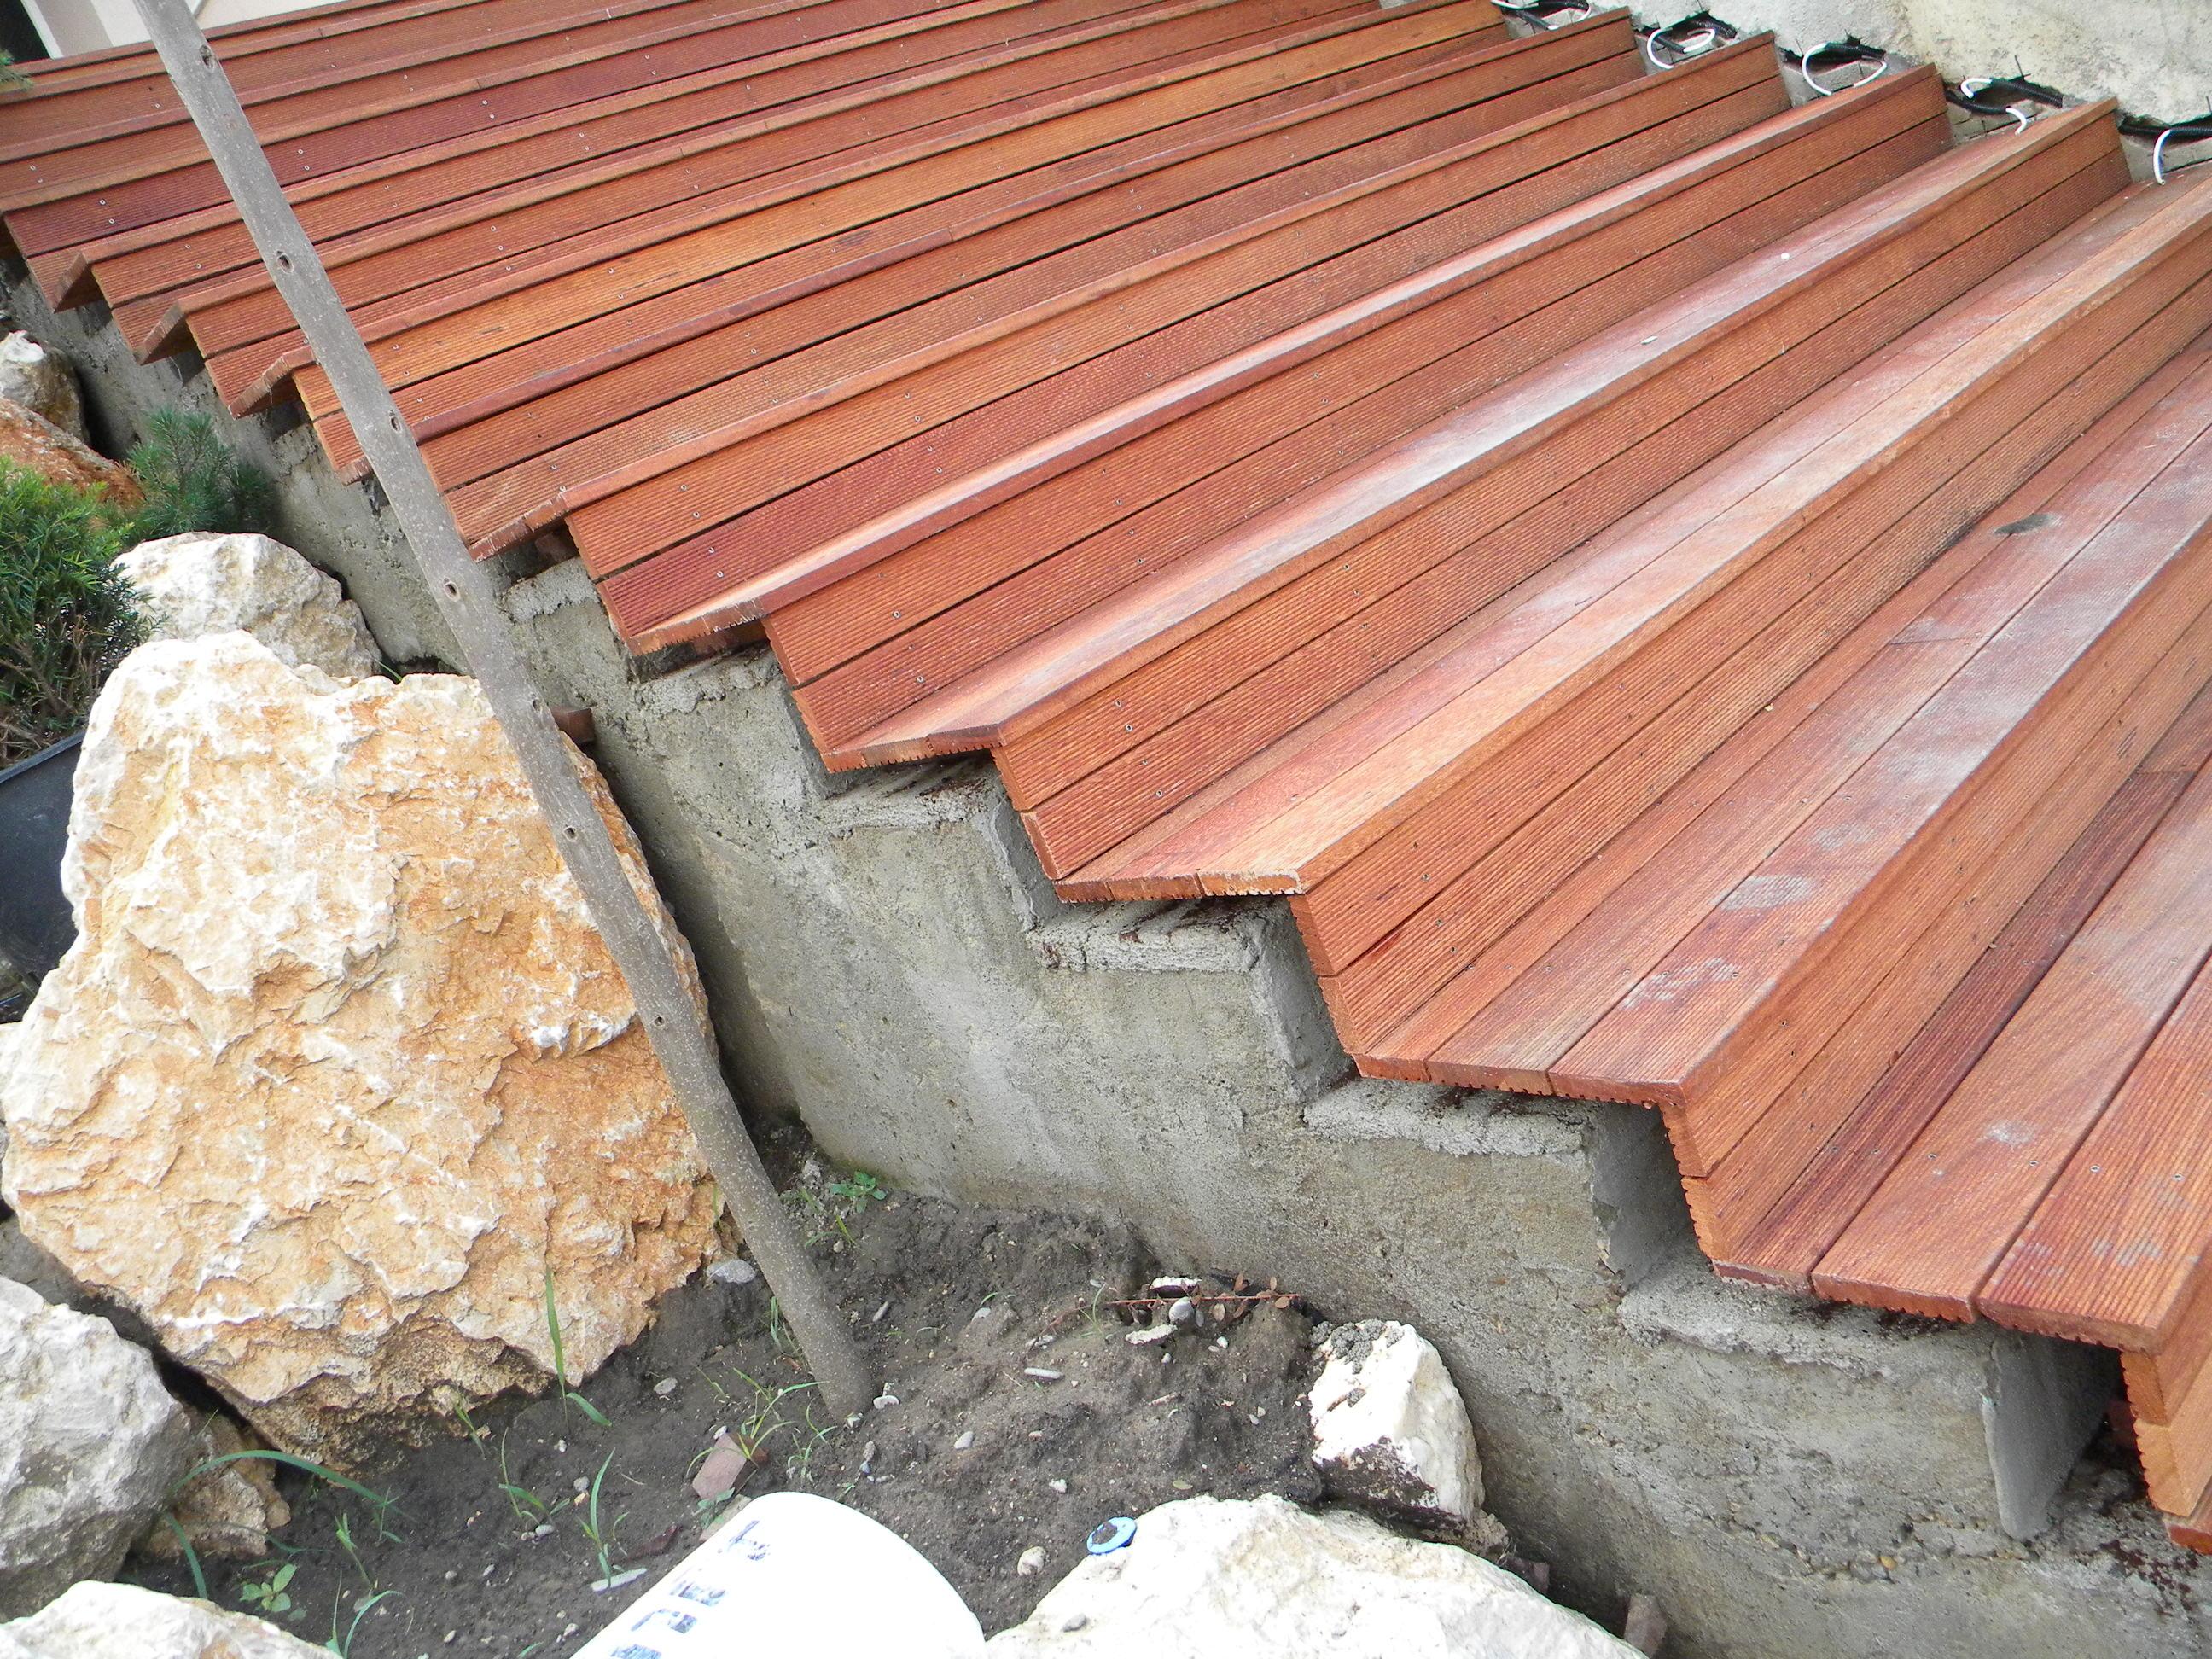 Deck-uri lemn - Angelim Pedra SELVA FLOORS - Poza 30